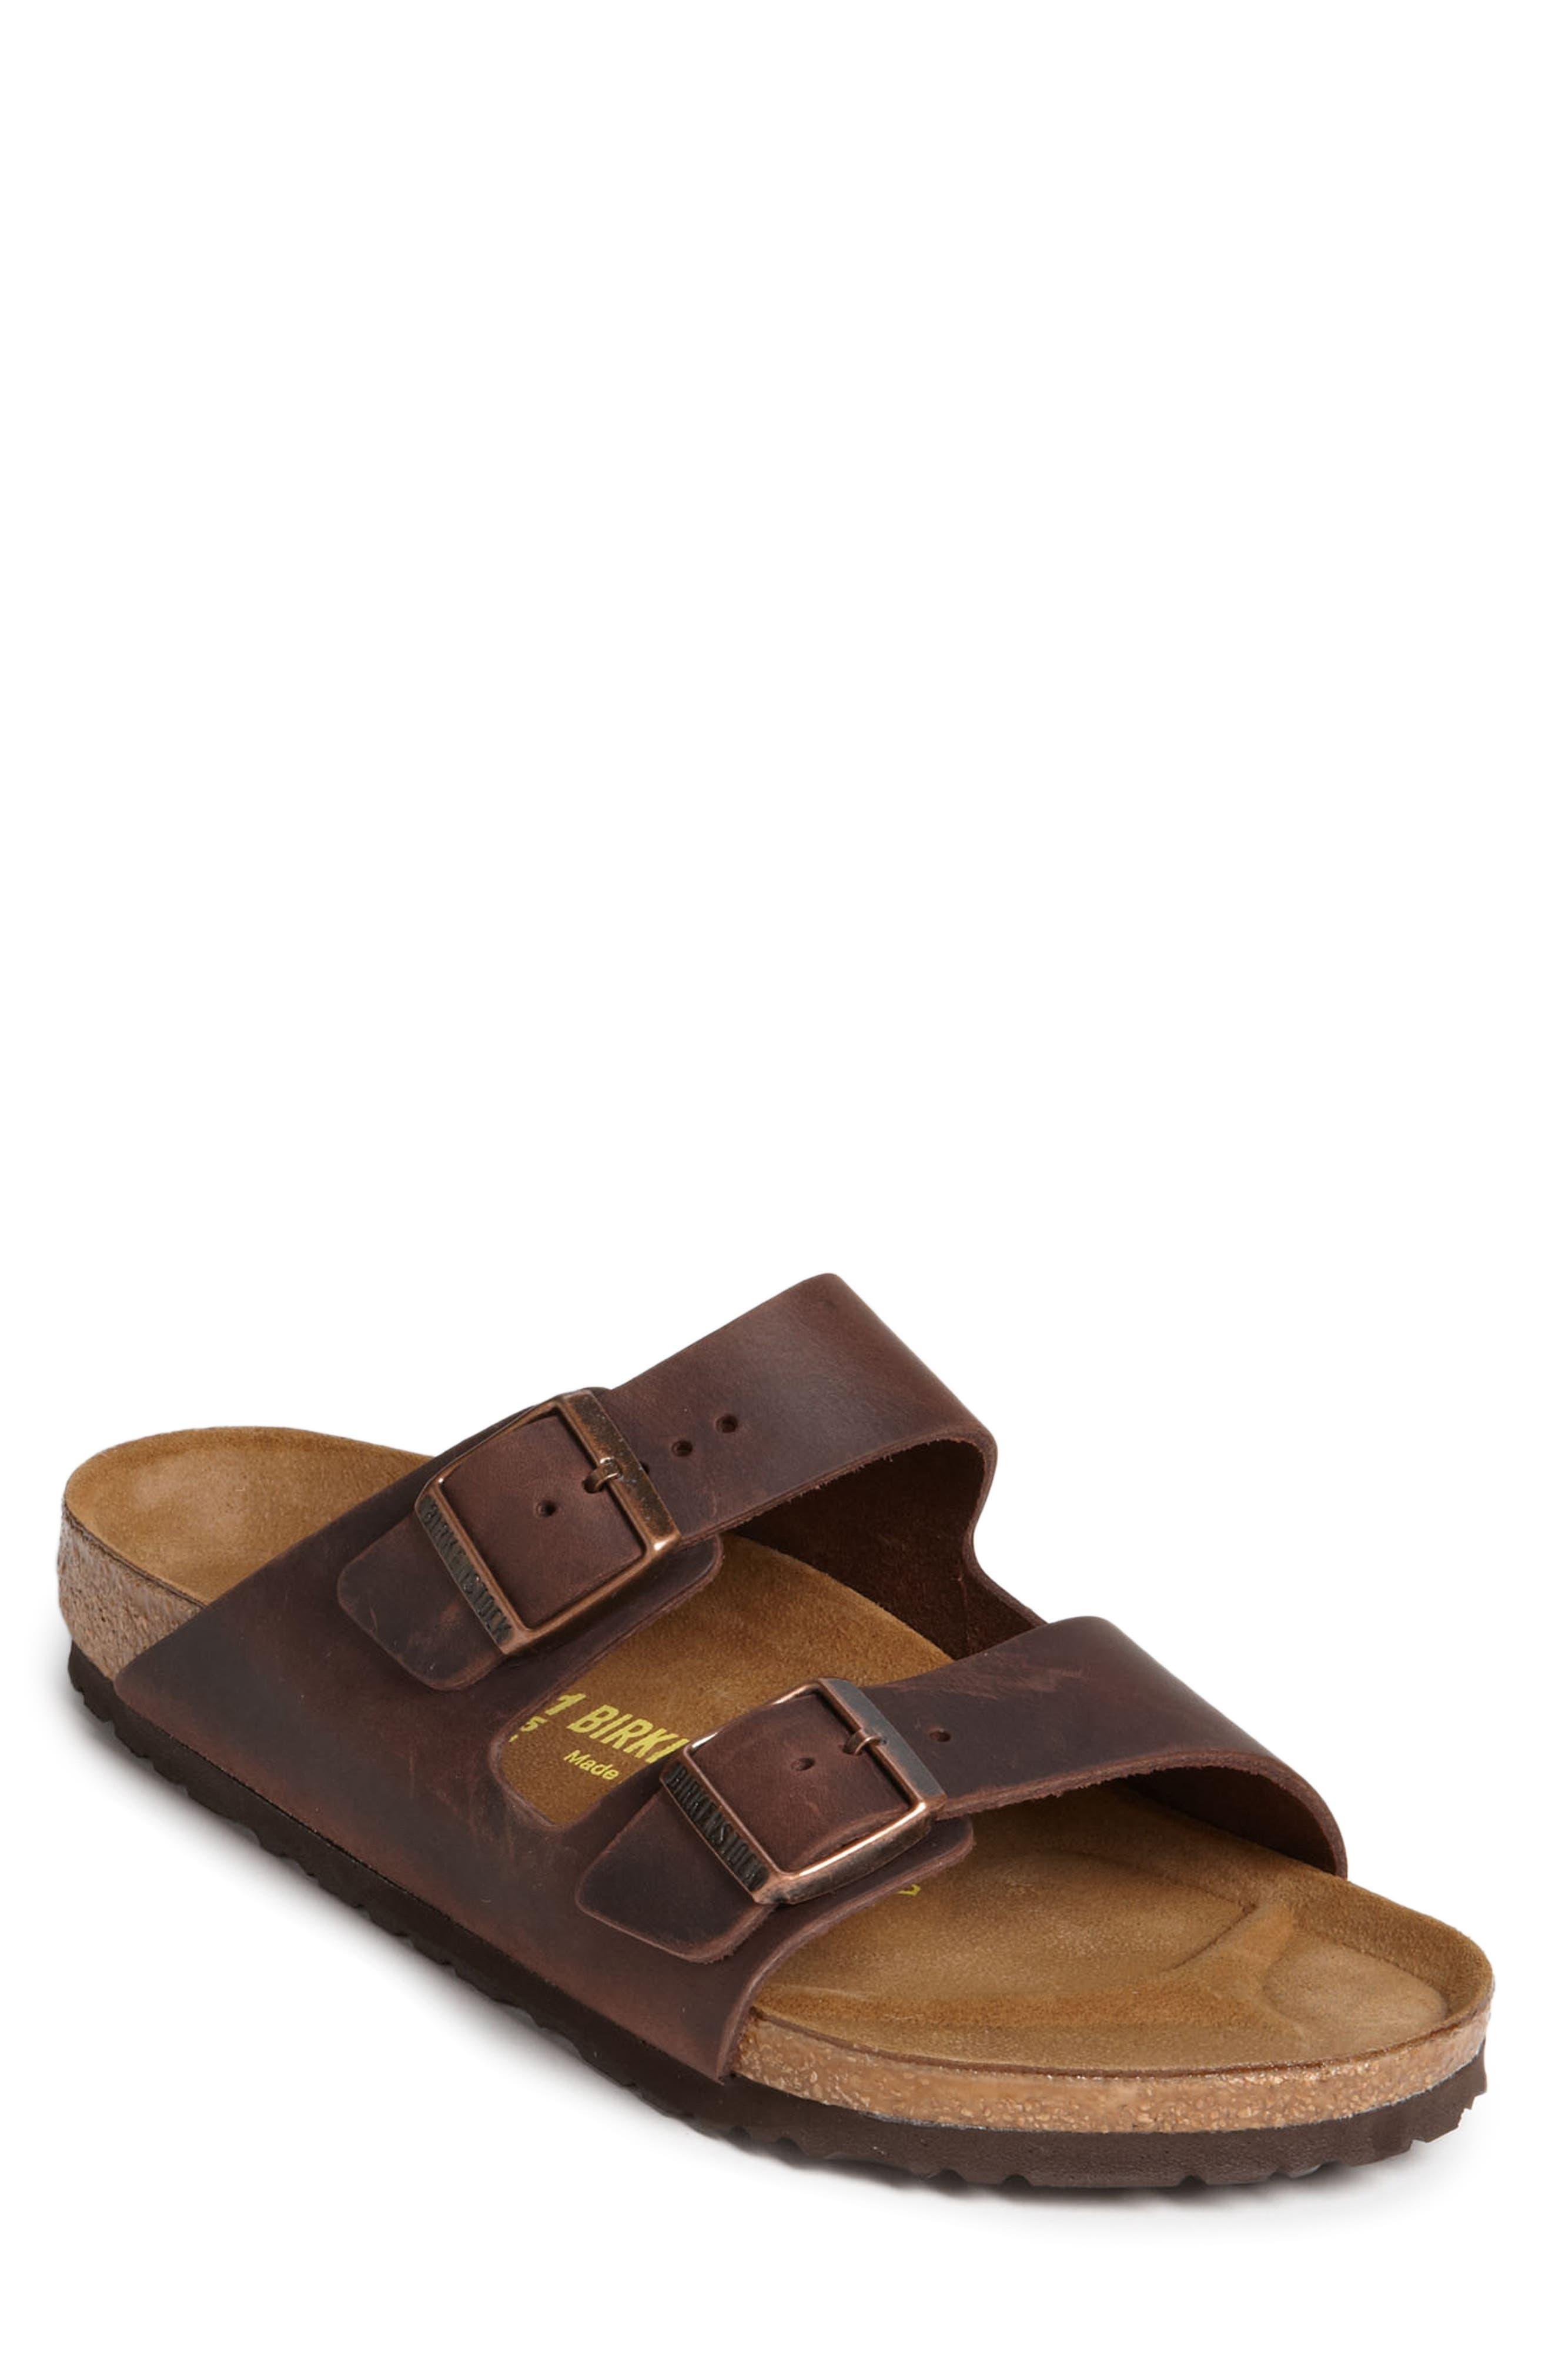 BIRKENSTOCK Arizona Slide Sandal, Main, color, HABANA OILED BROWN